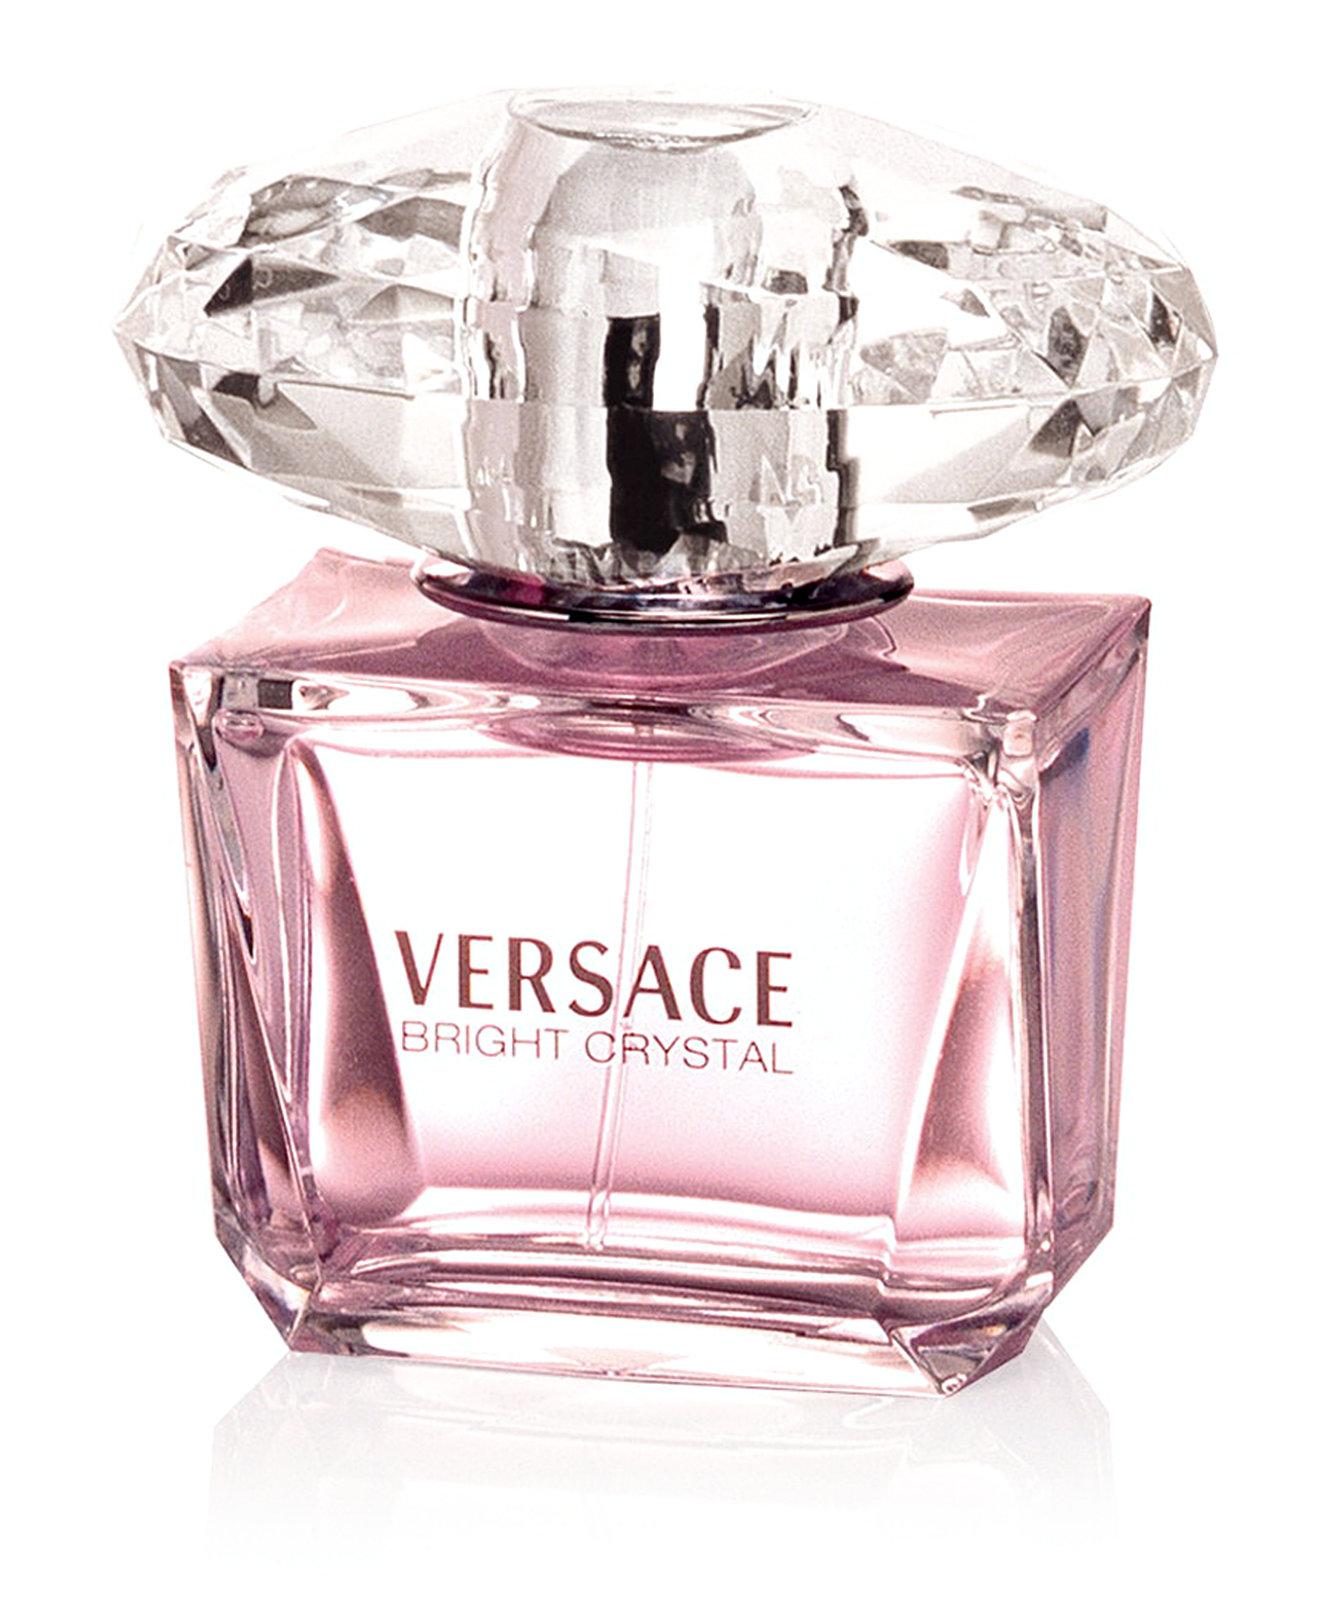 Elisabeth Erm uses Bright Crystal (Perfume )